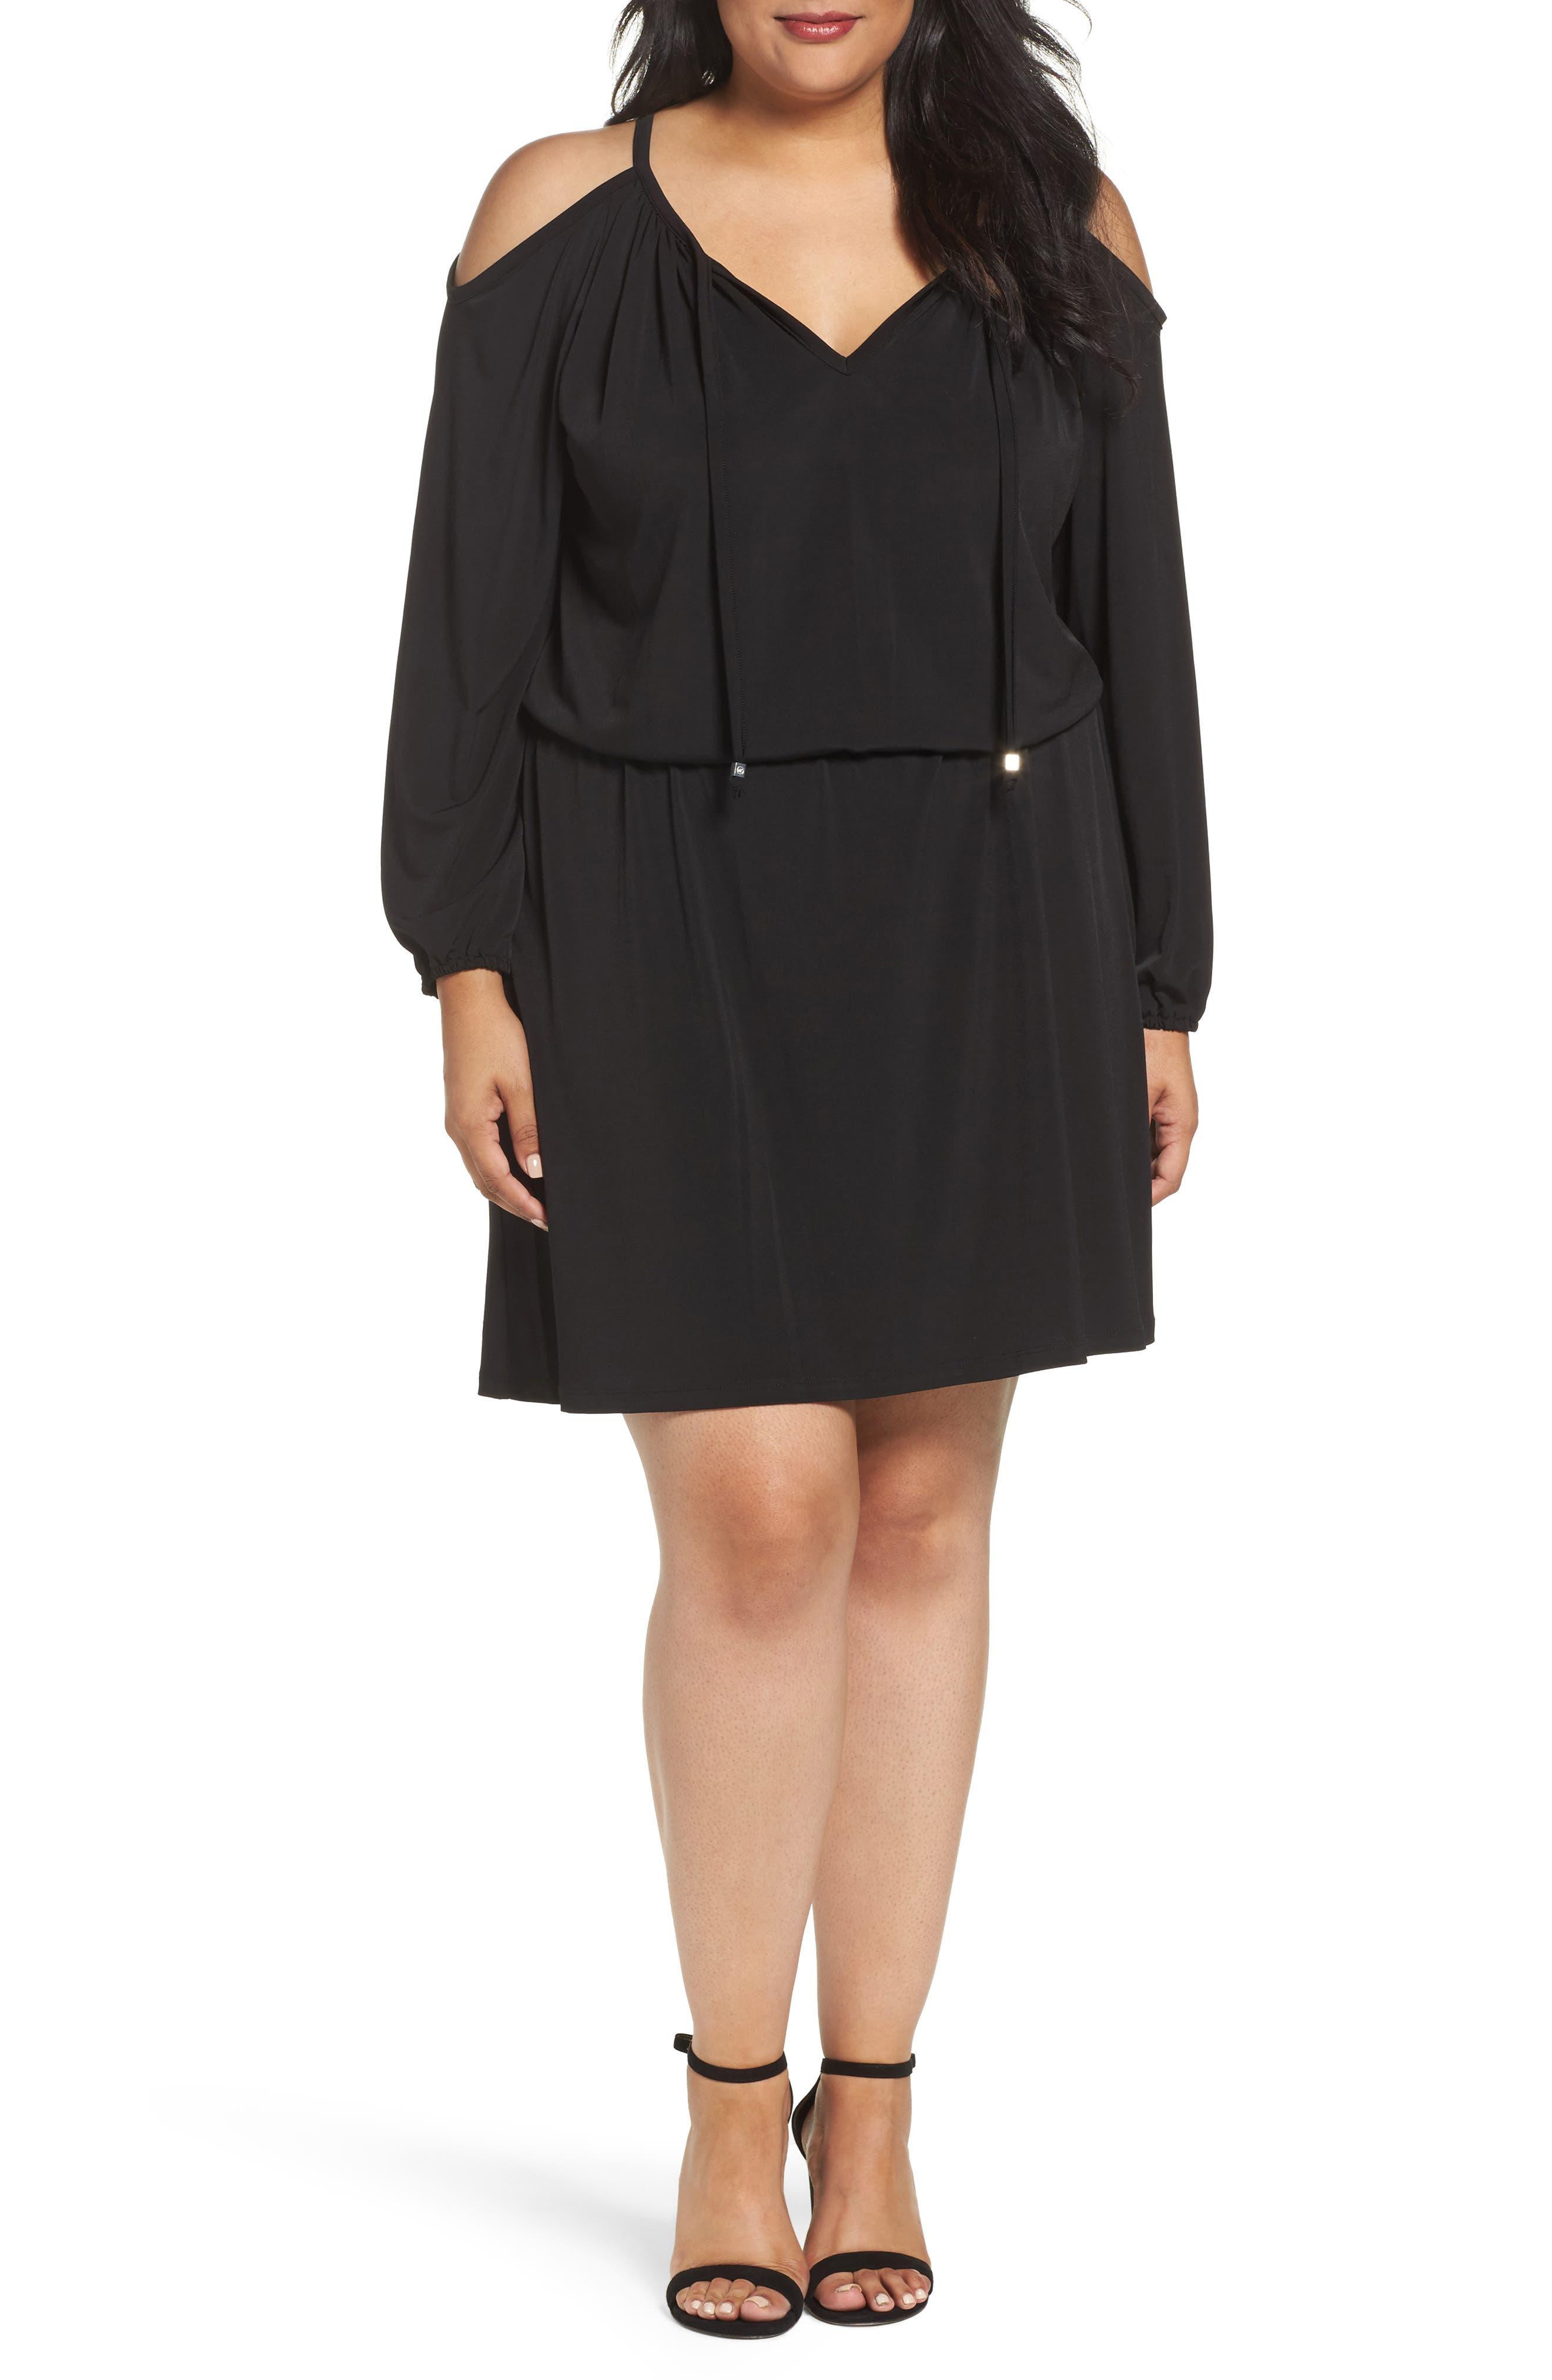 Alternate Image 1 Selected - MICHAEL Michael Kors Cold Shoulder A-Line Jersey Dress (Plus Size)